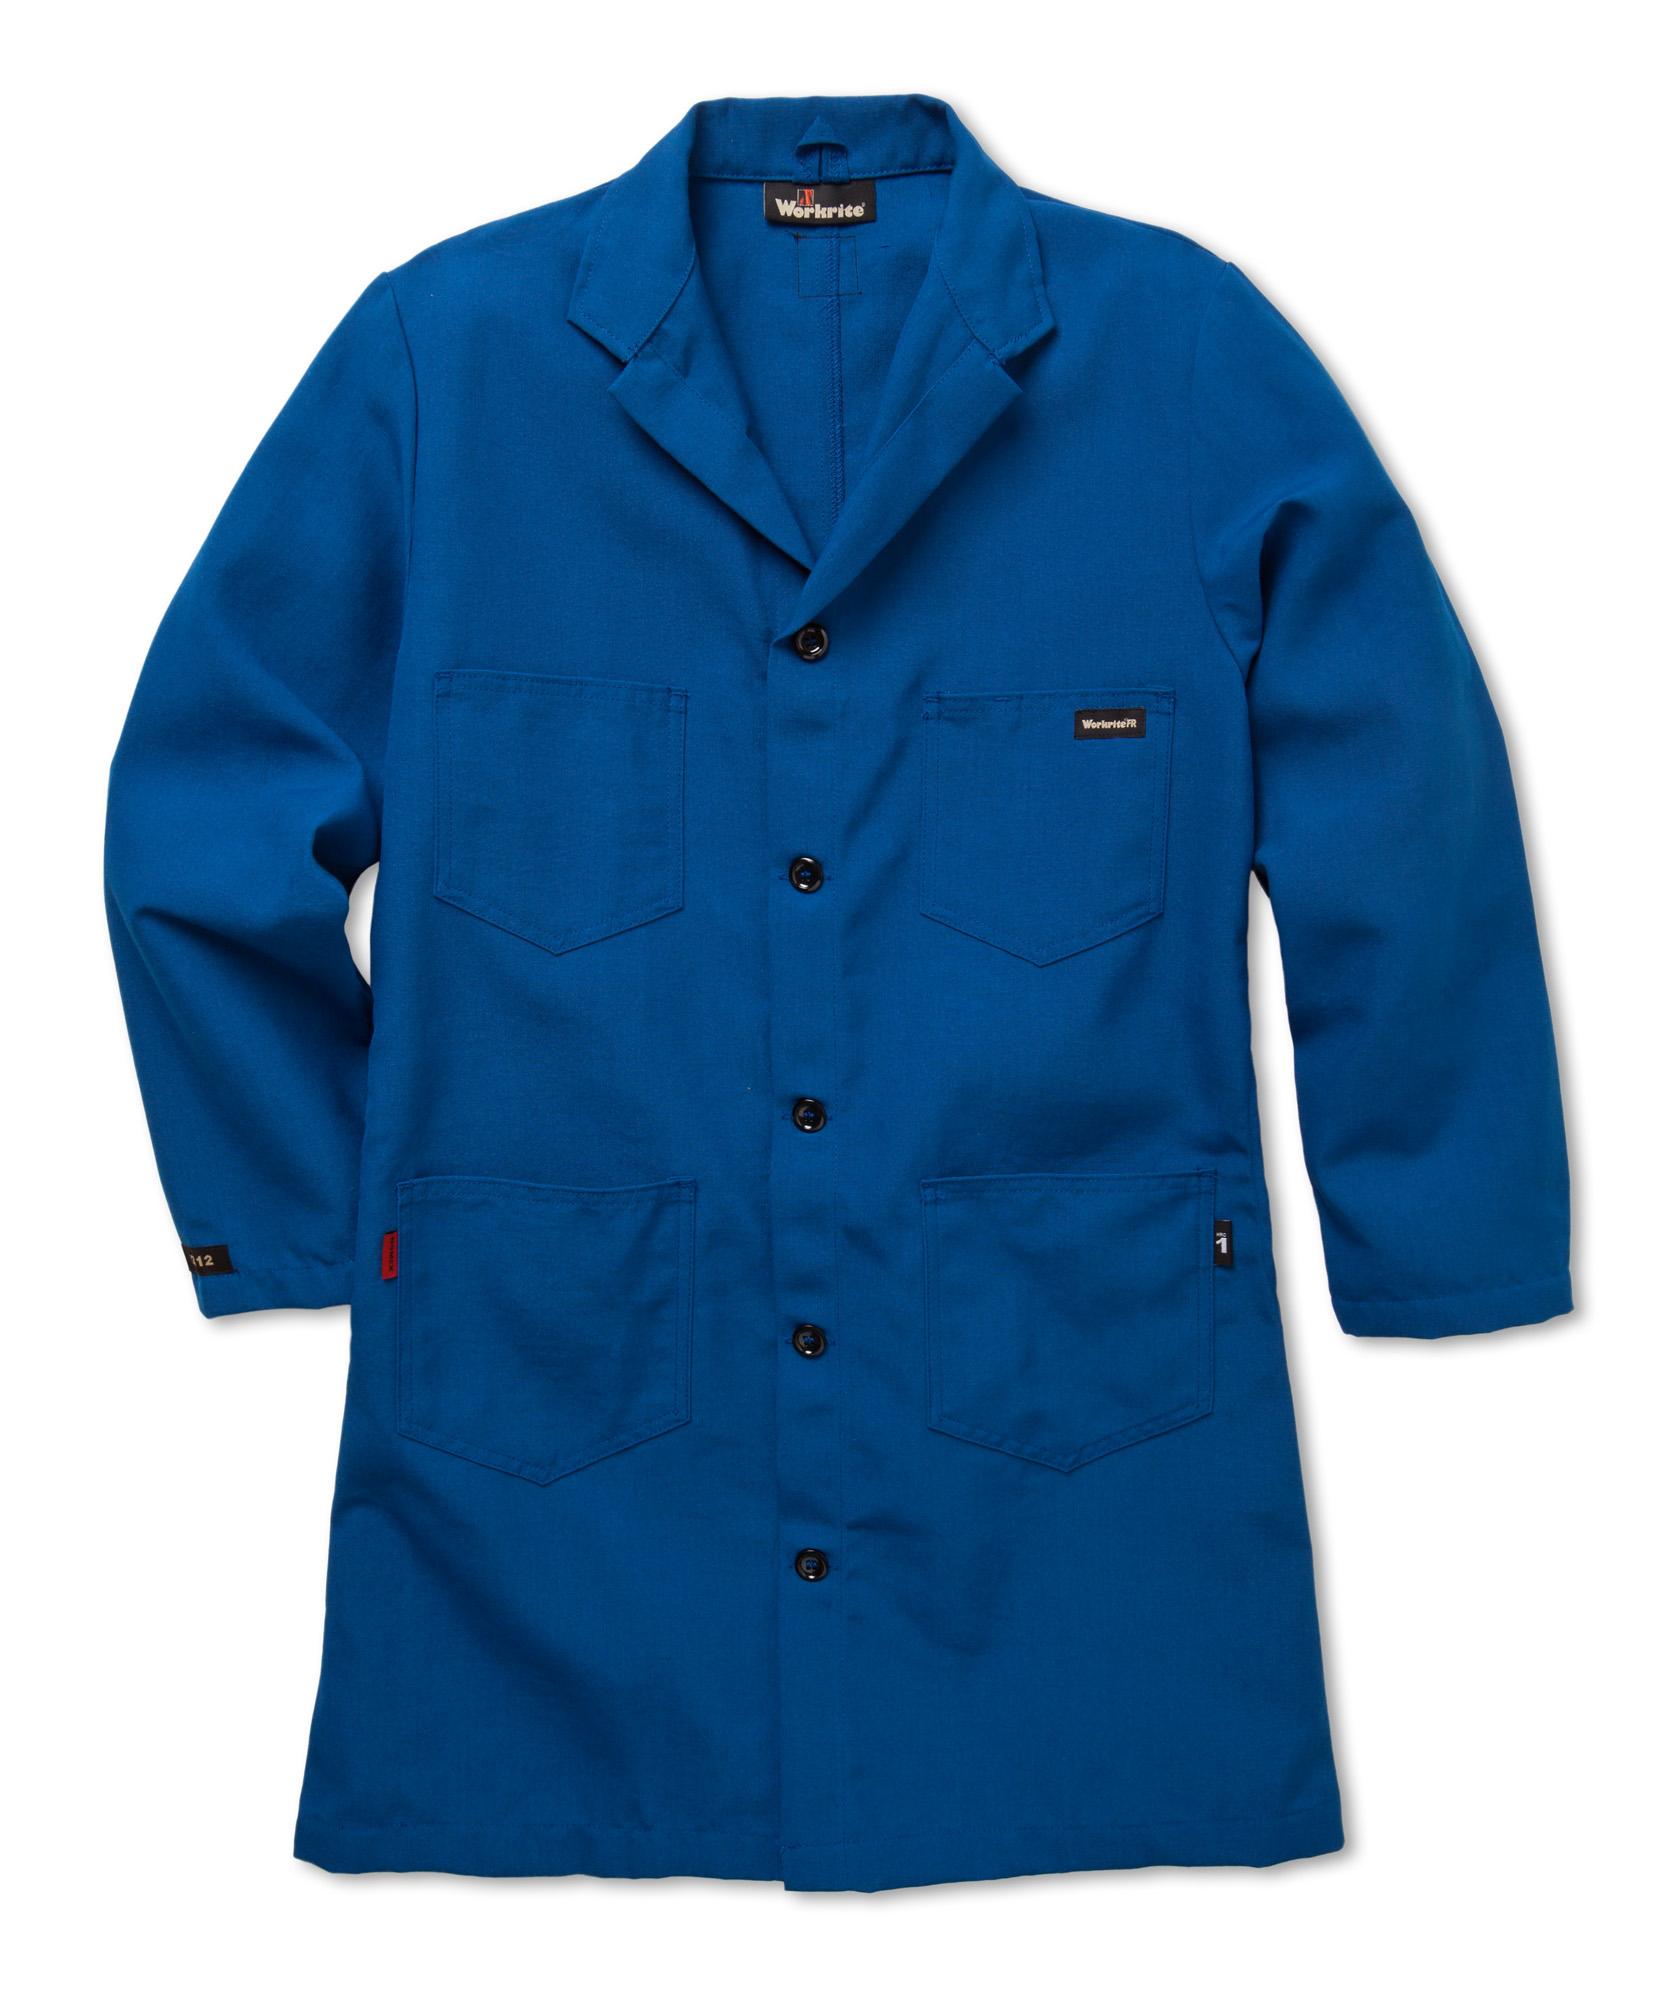 e87ddb3beadd Workrite Uniform Co. - Workrite 6 oz Nomex IIIA Lab Coat  350NX60